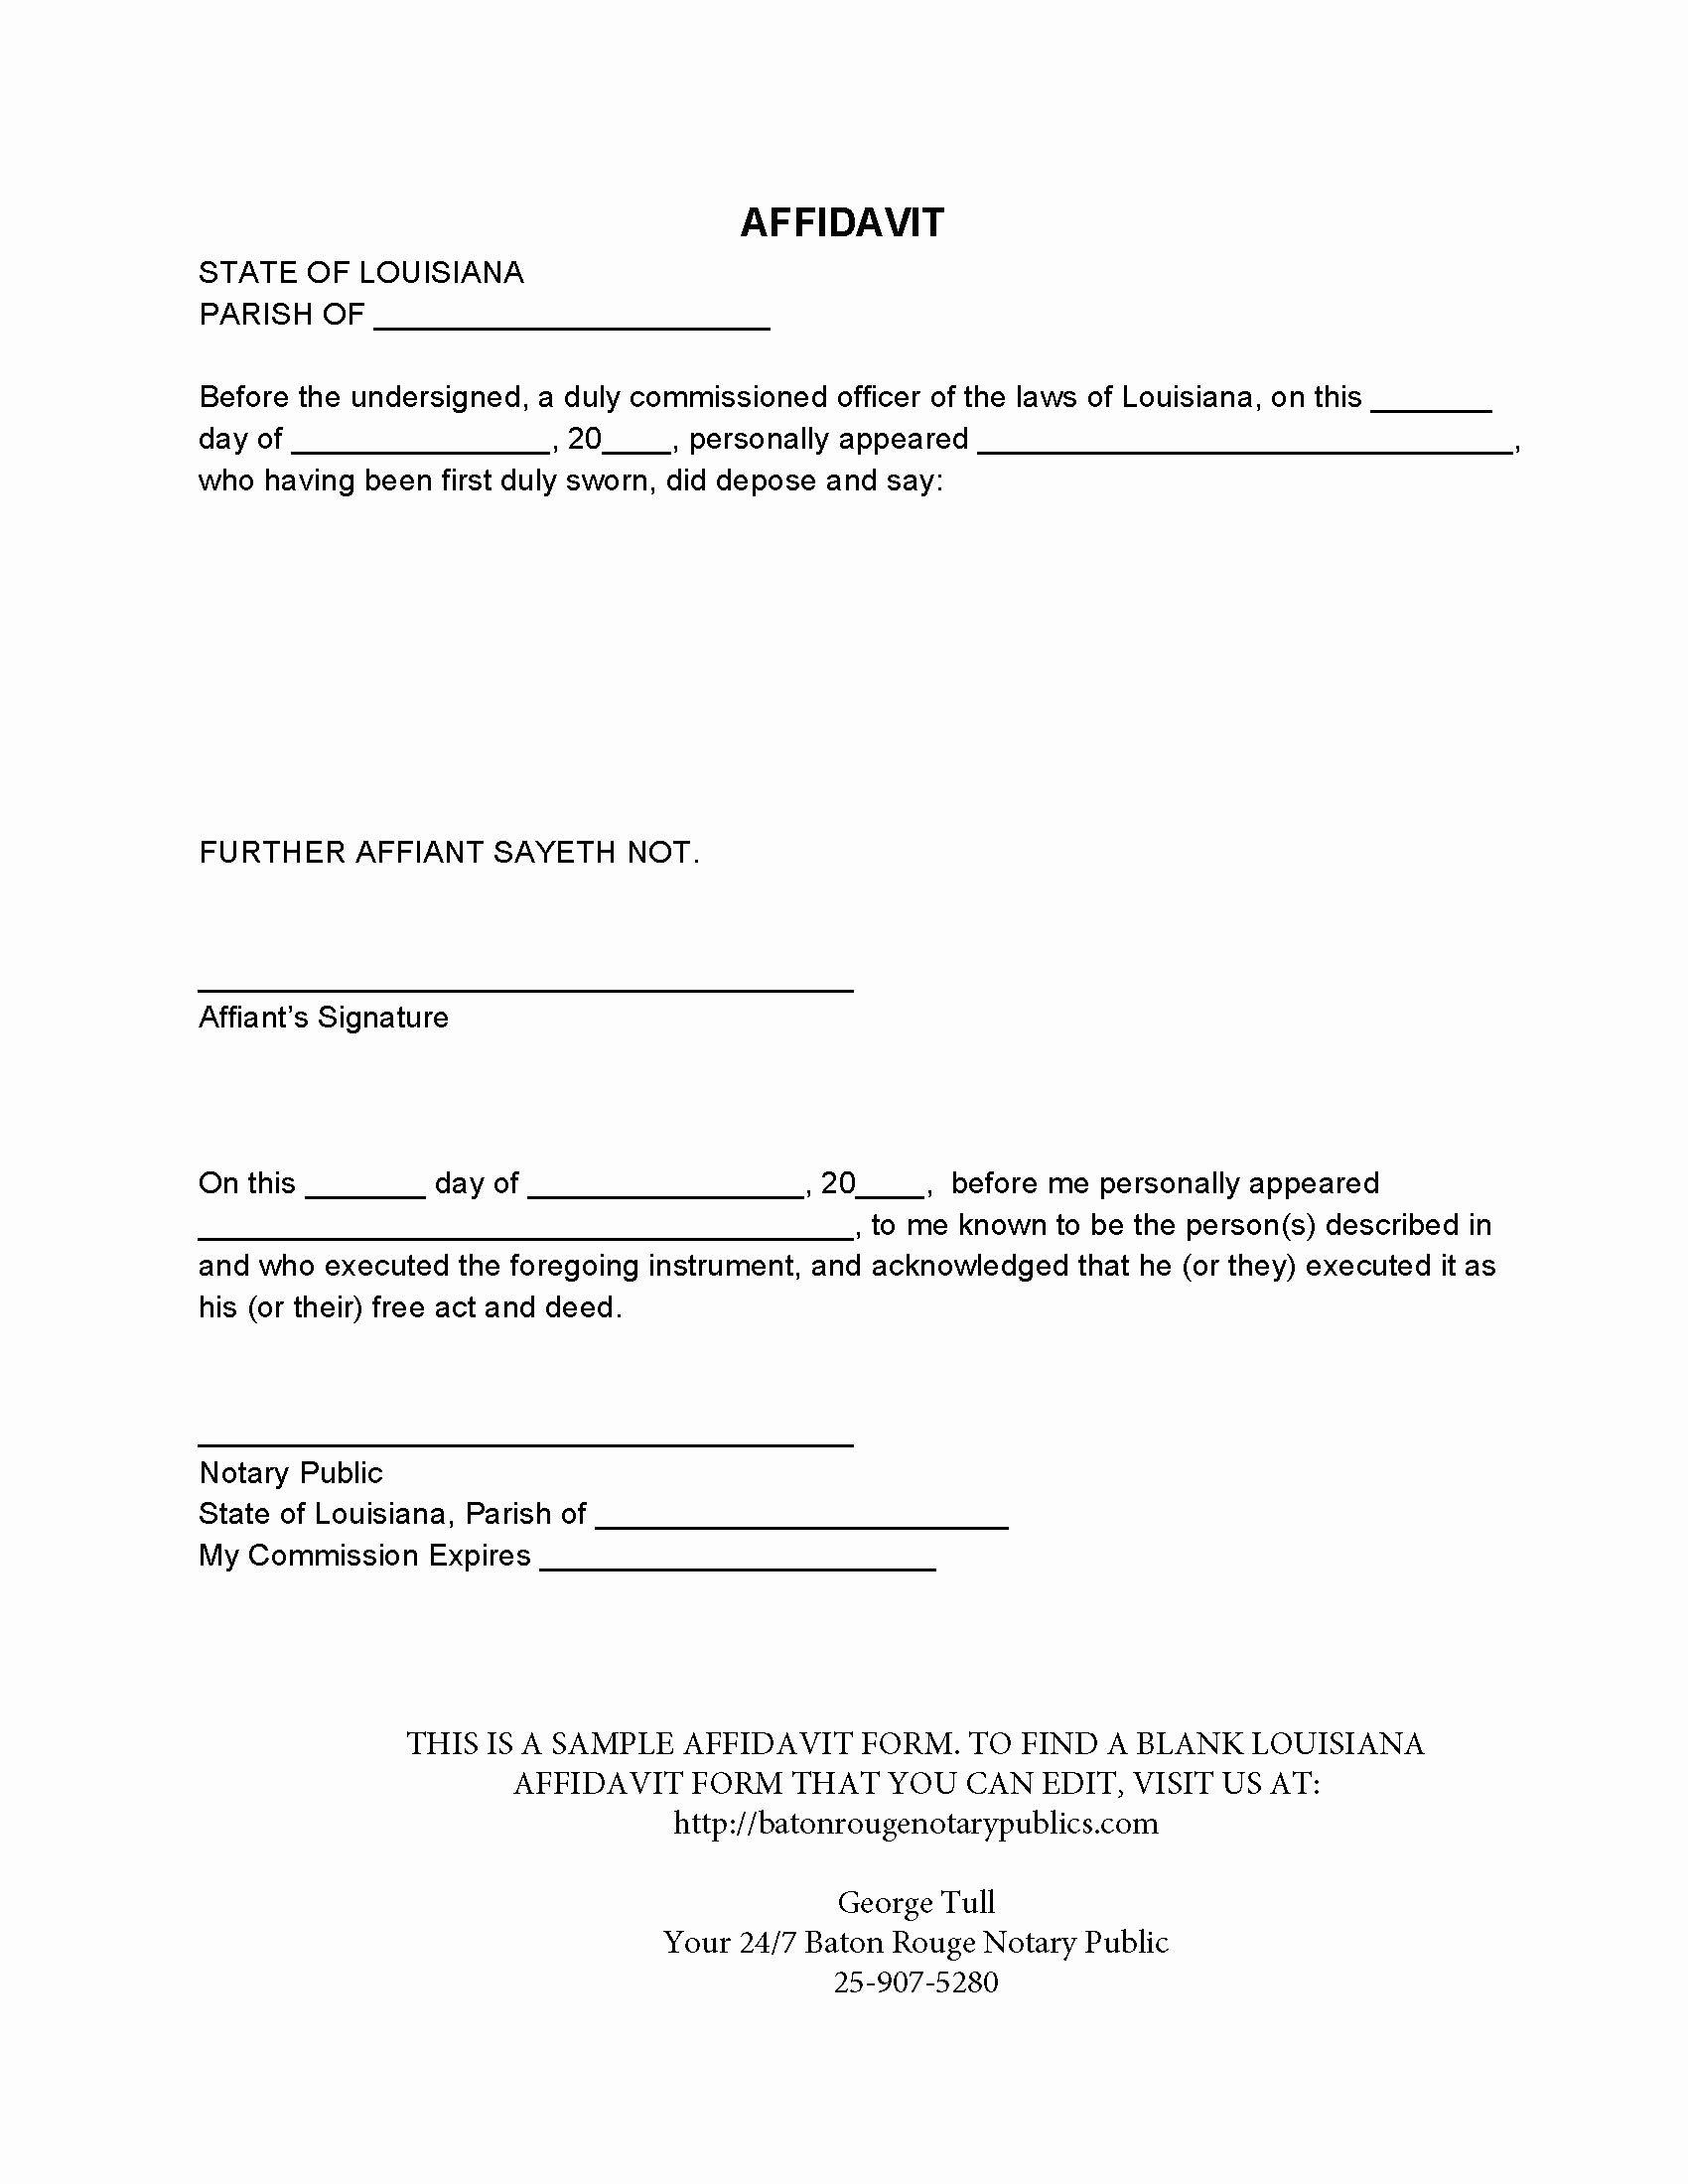 General Affidavit Template Word Best Of 38 Perfect Examples Affidavit form Templates Thogati